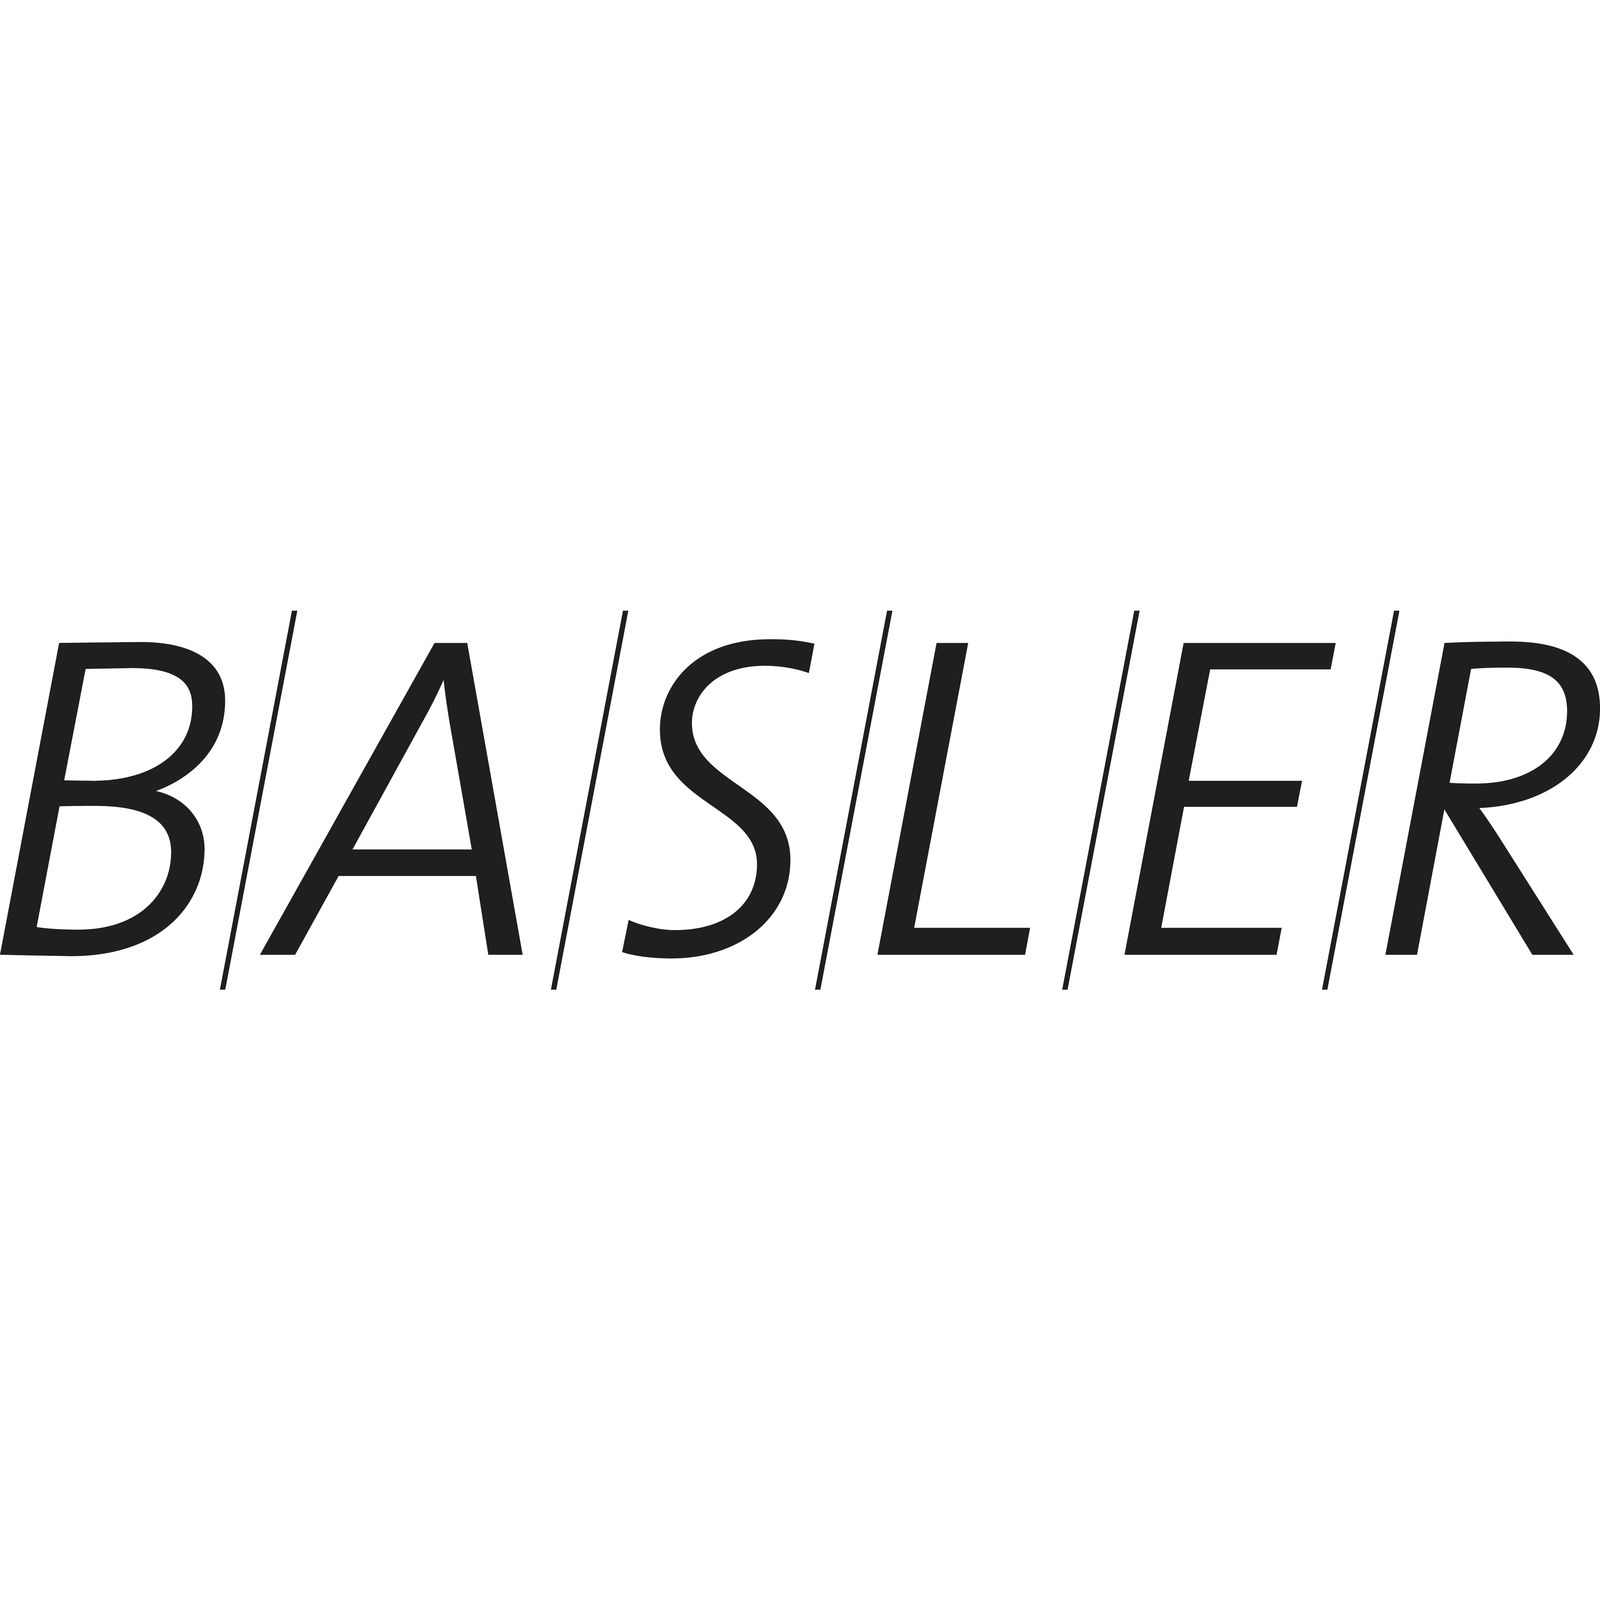 BASLER (Bild 1)